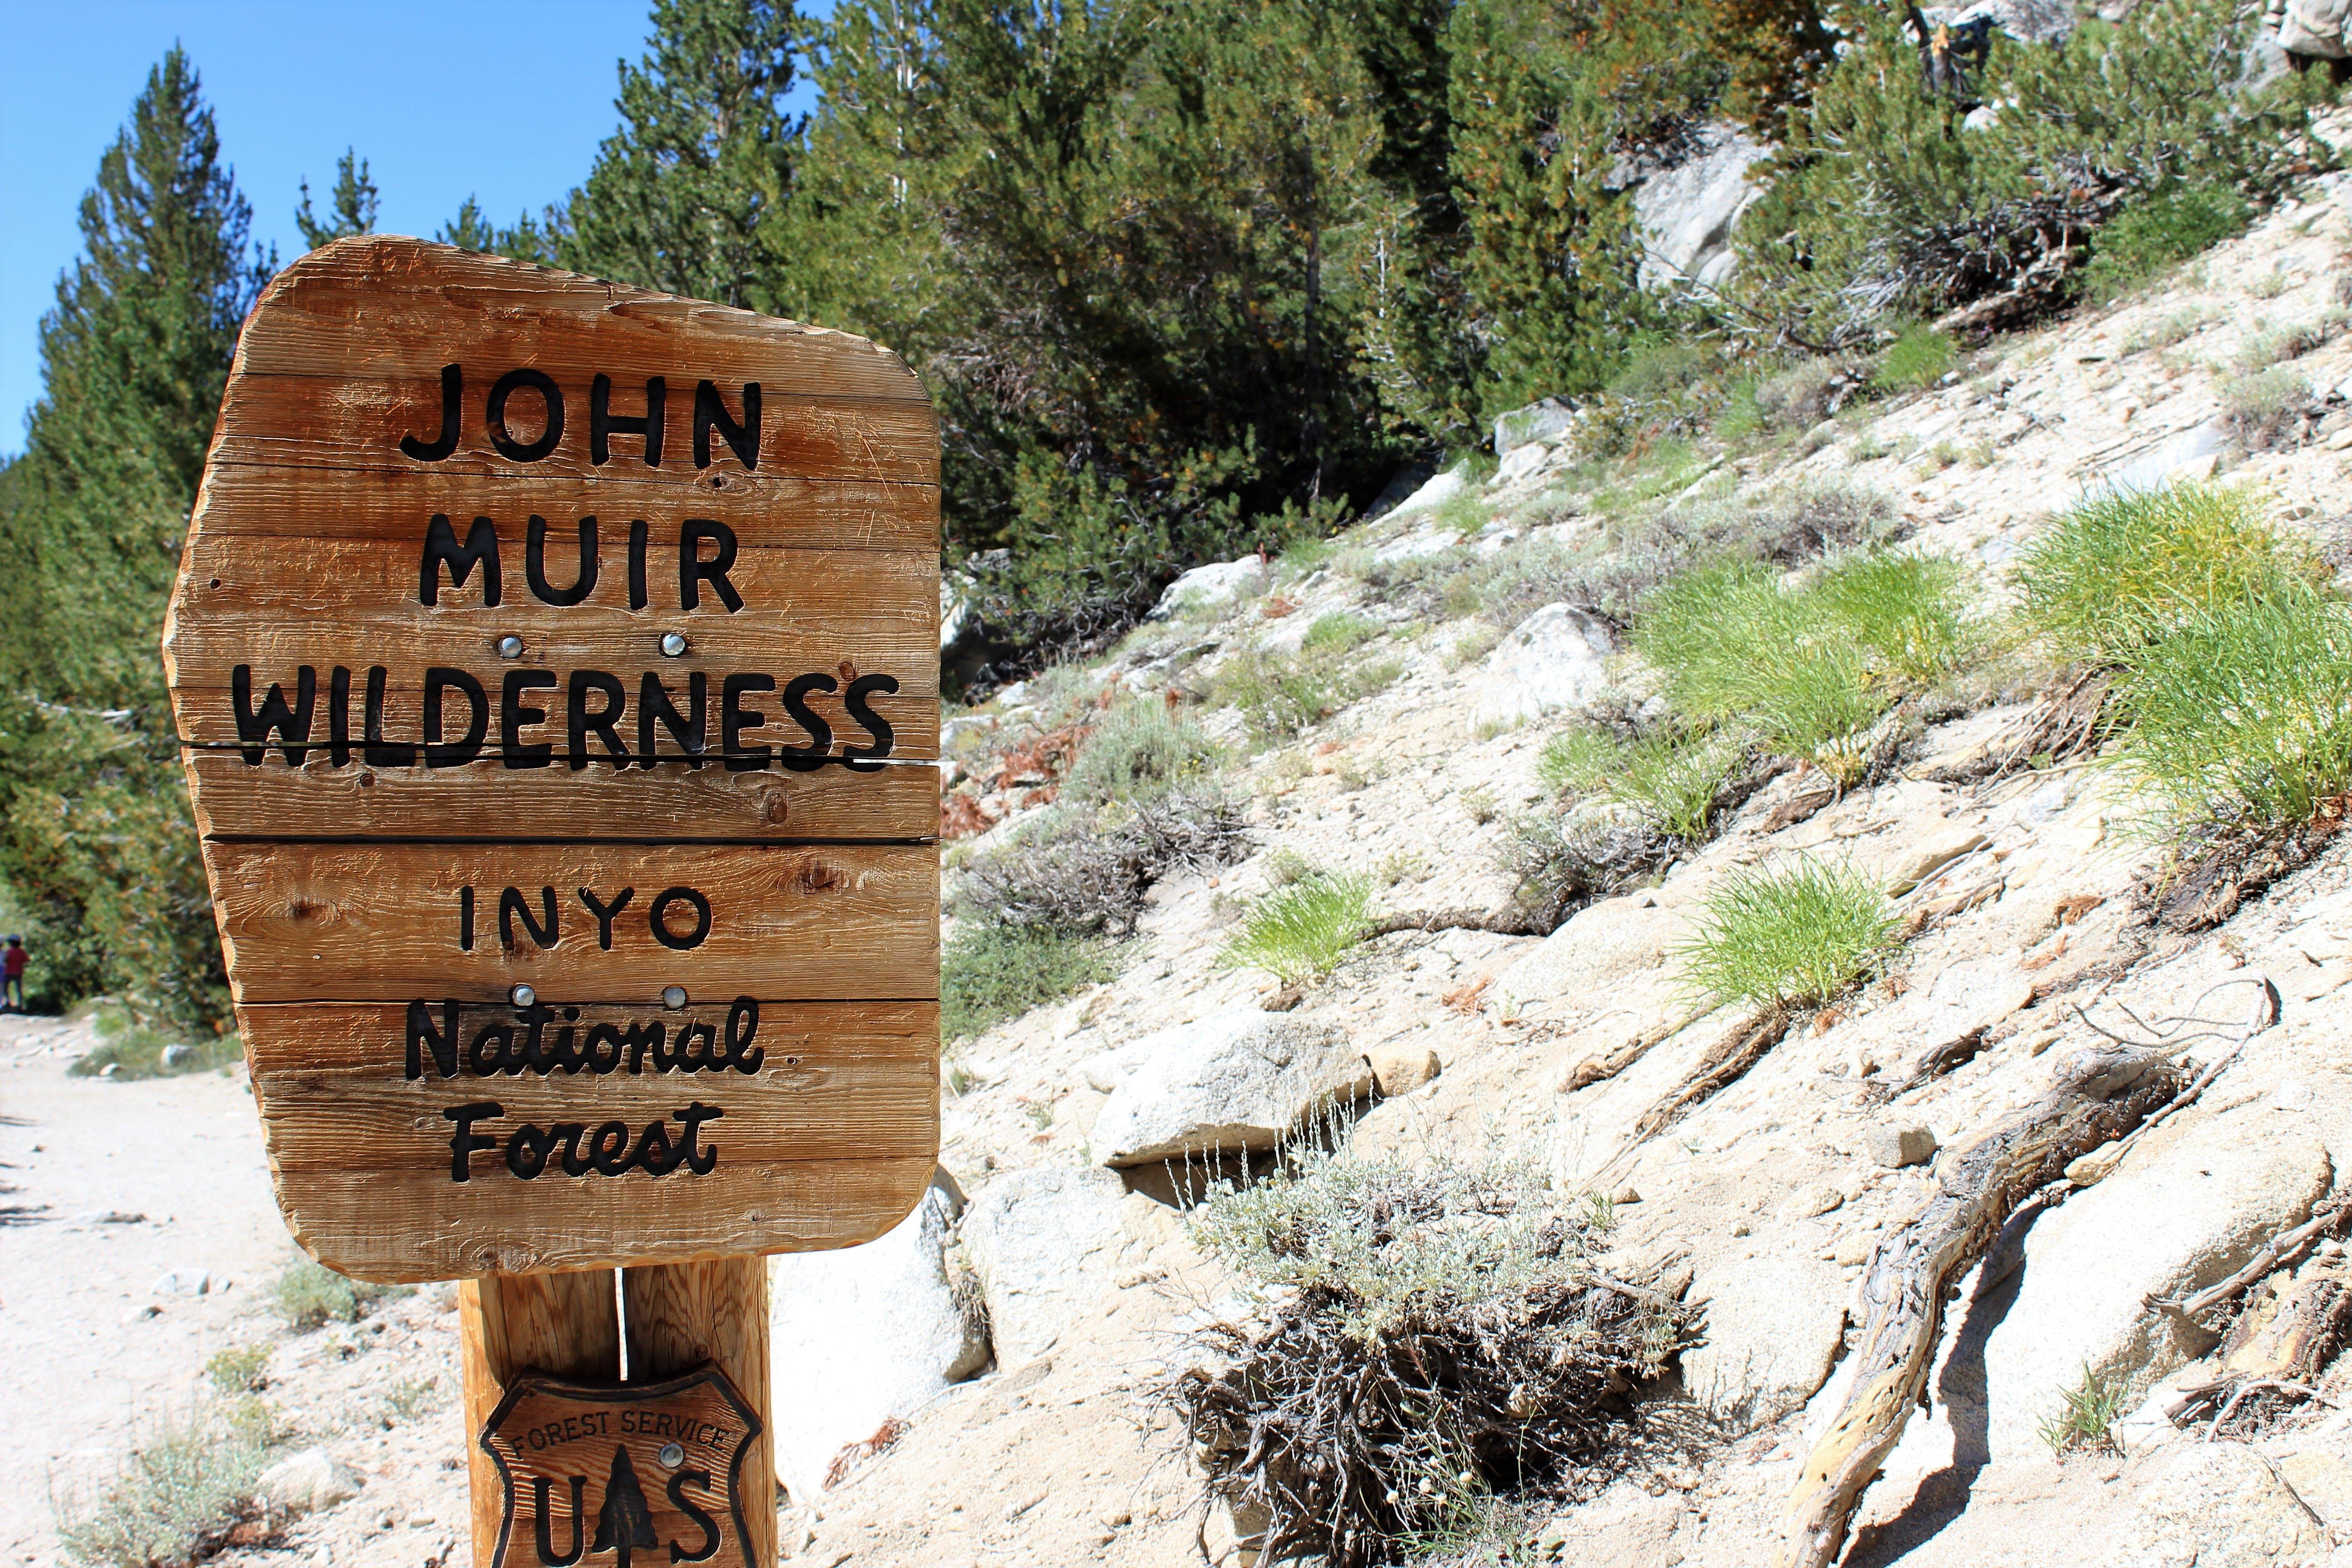 John Muir Wilderness Signage